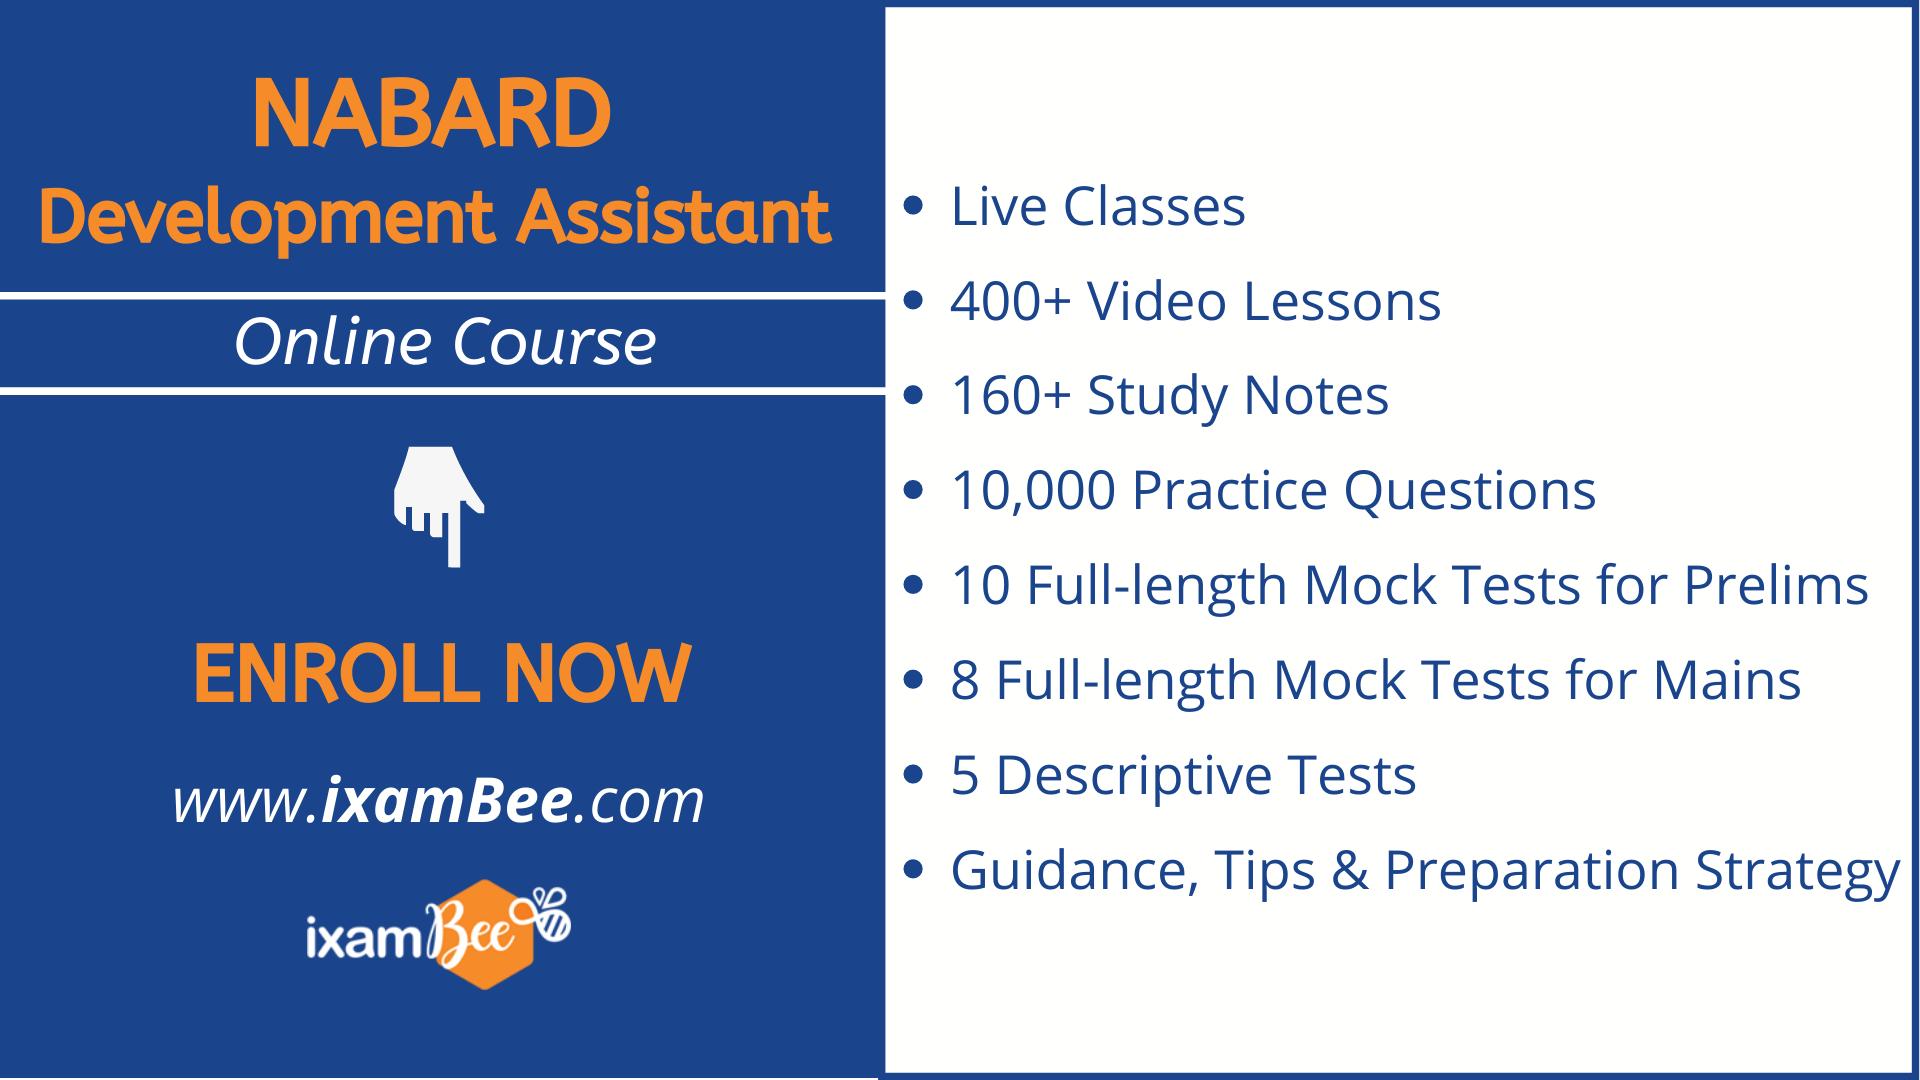 nabard development assistant online course